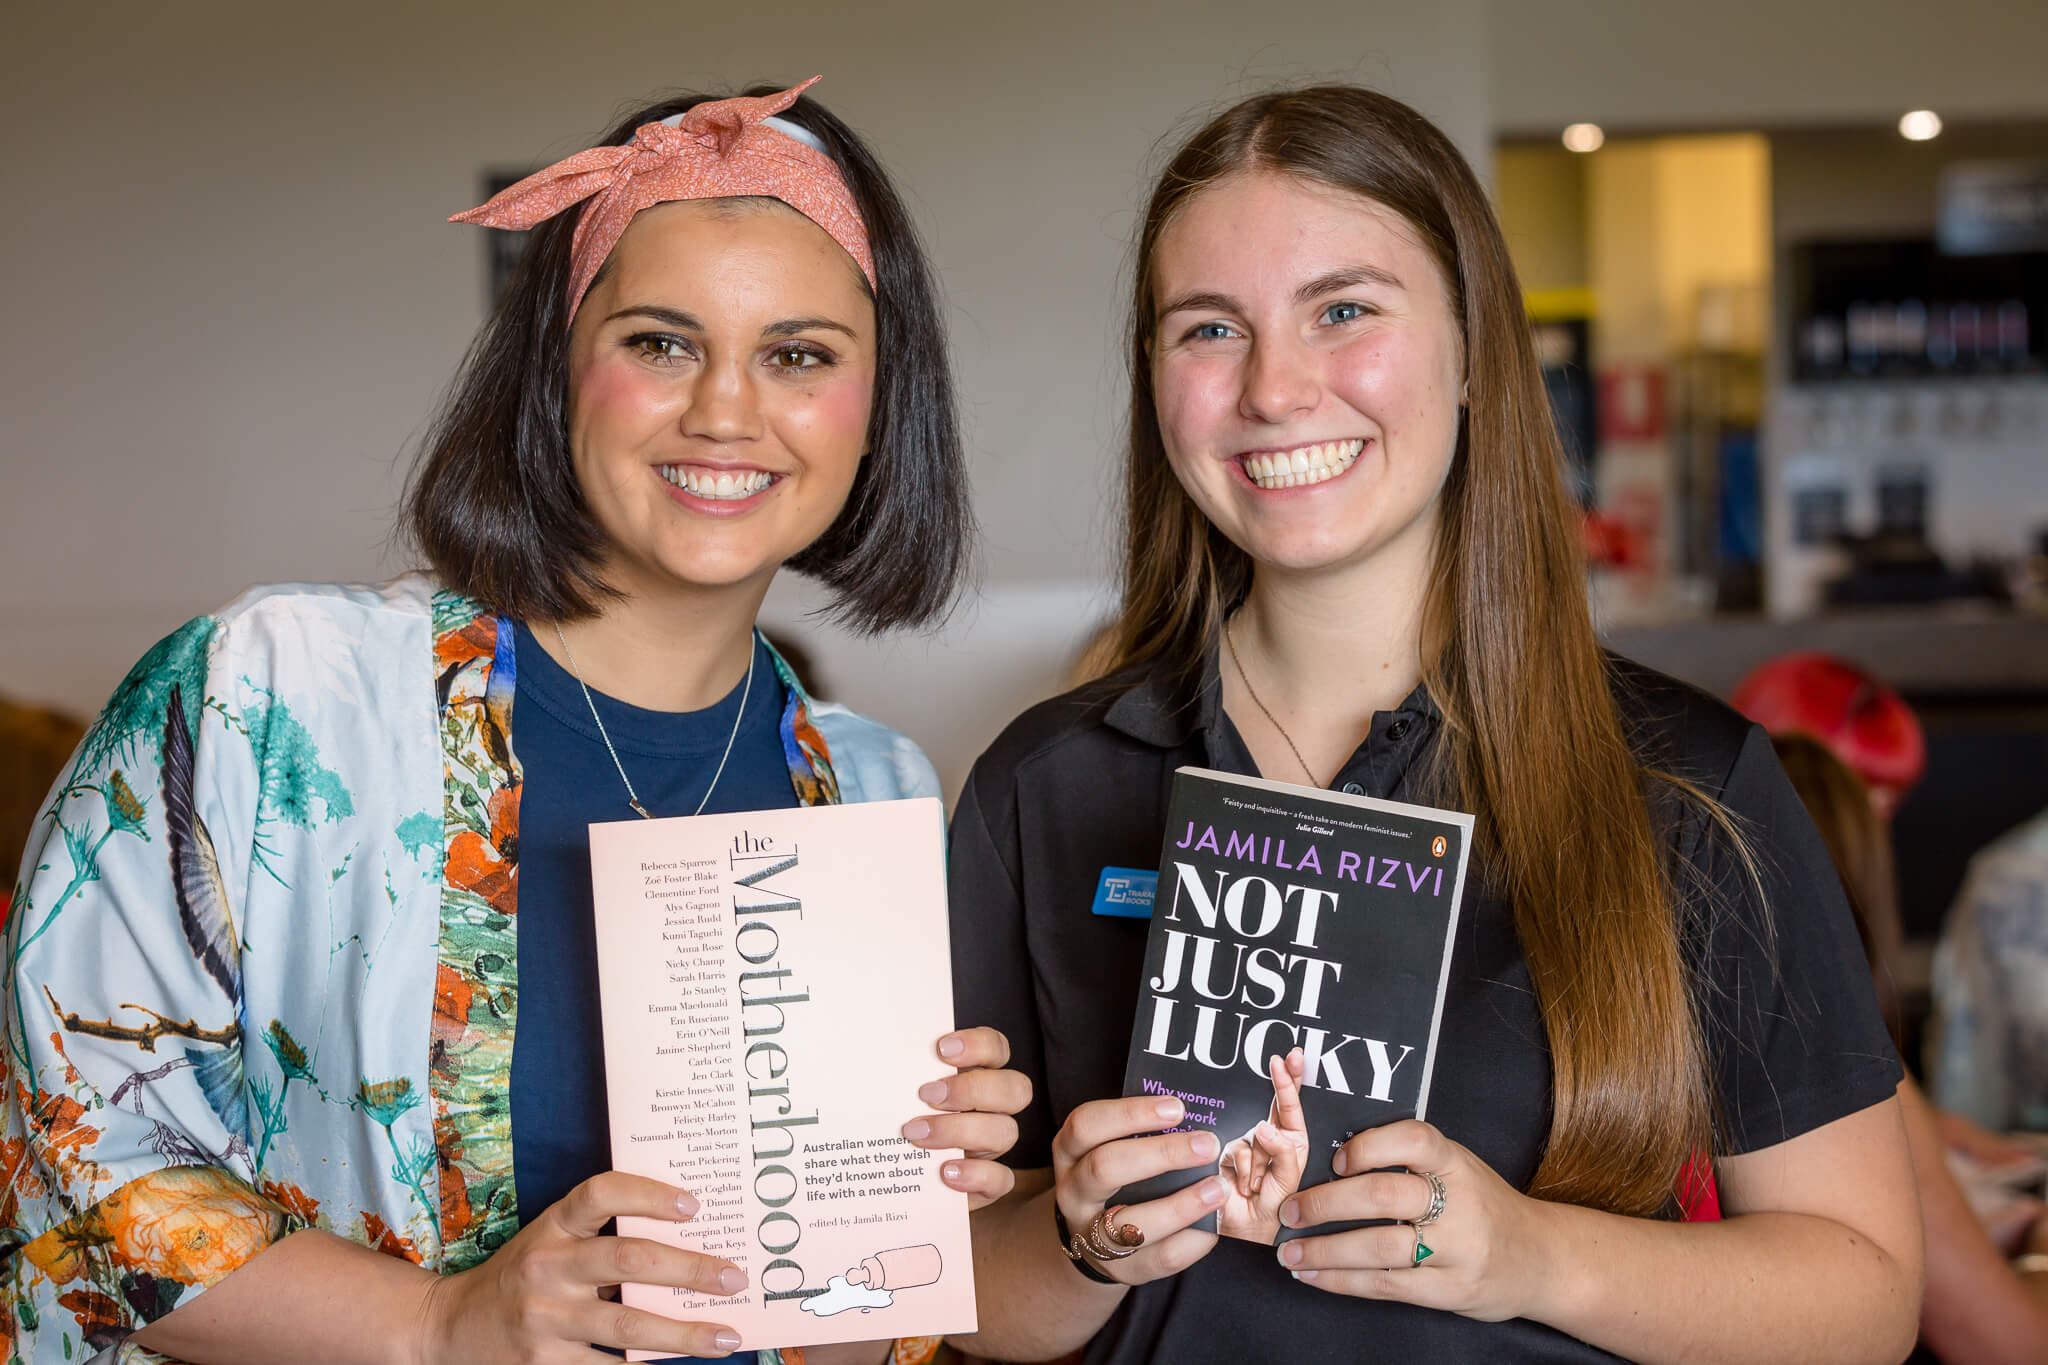 Jamila Rizvi with her books at LWIB event